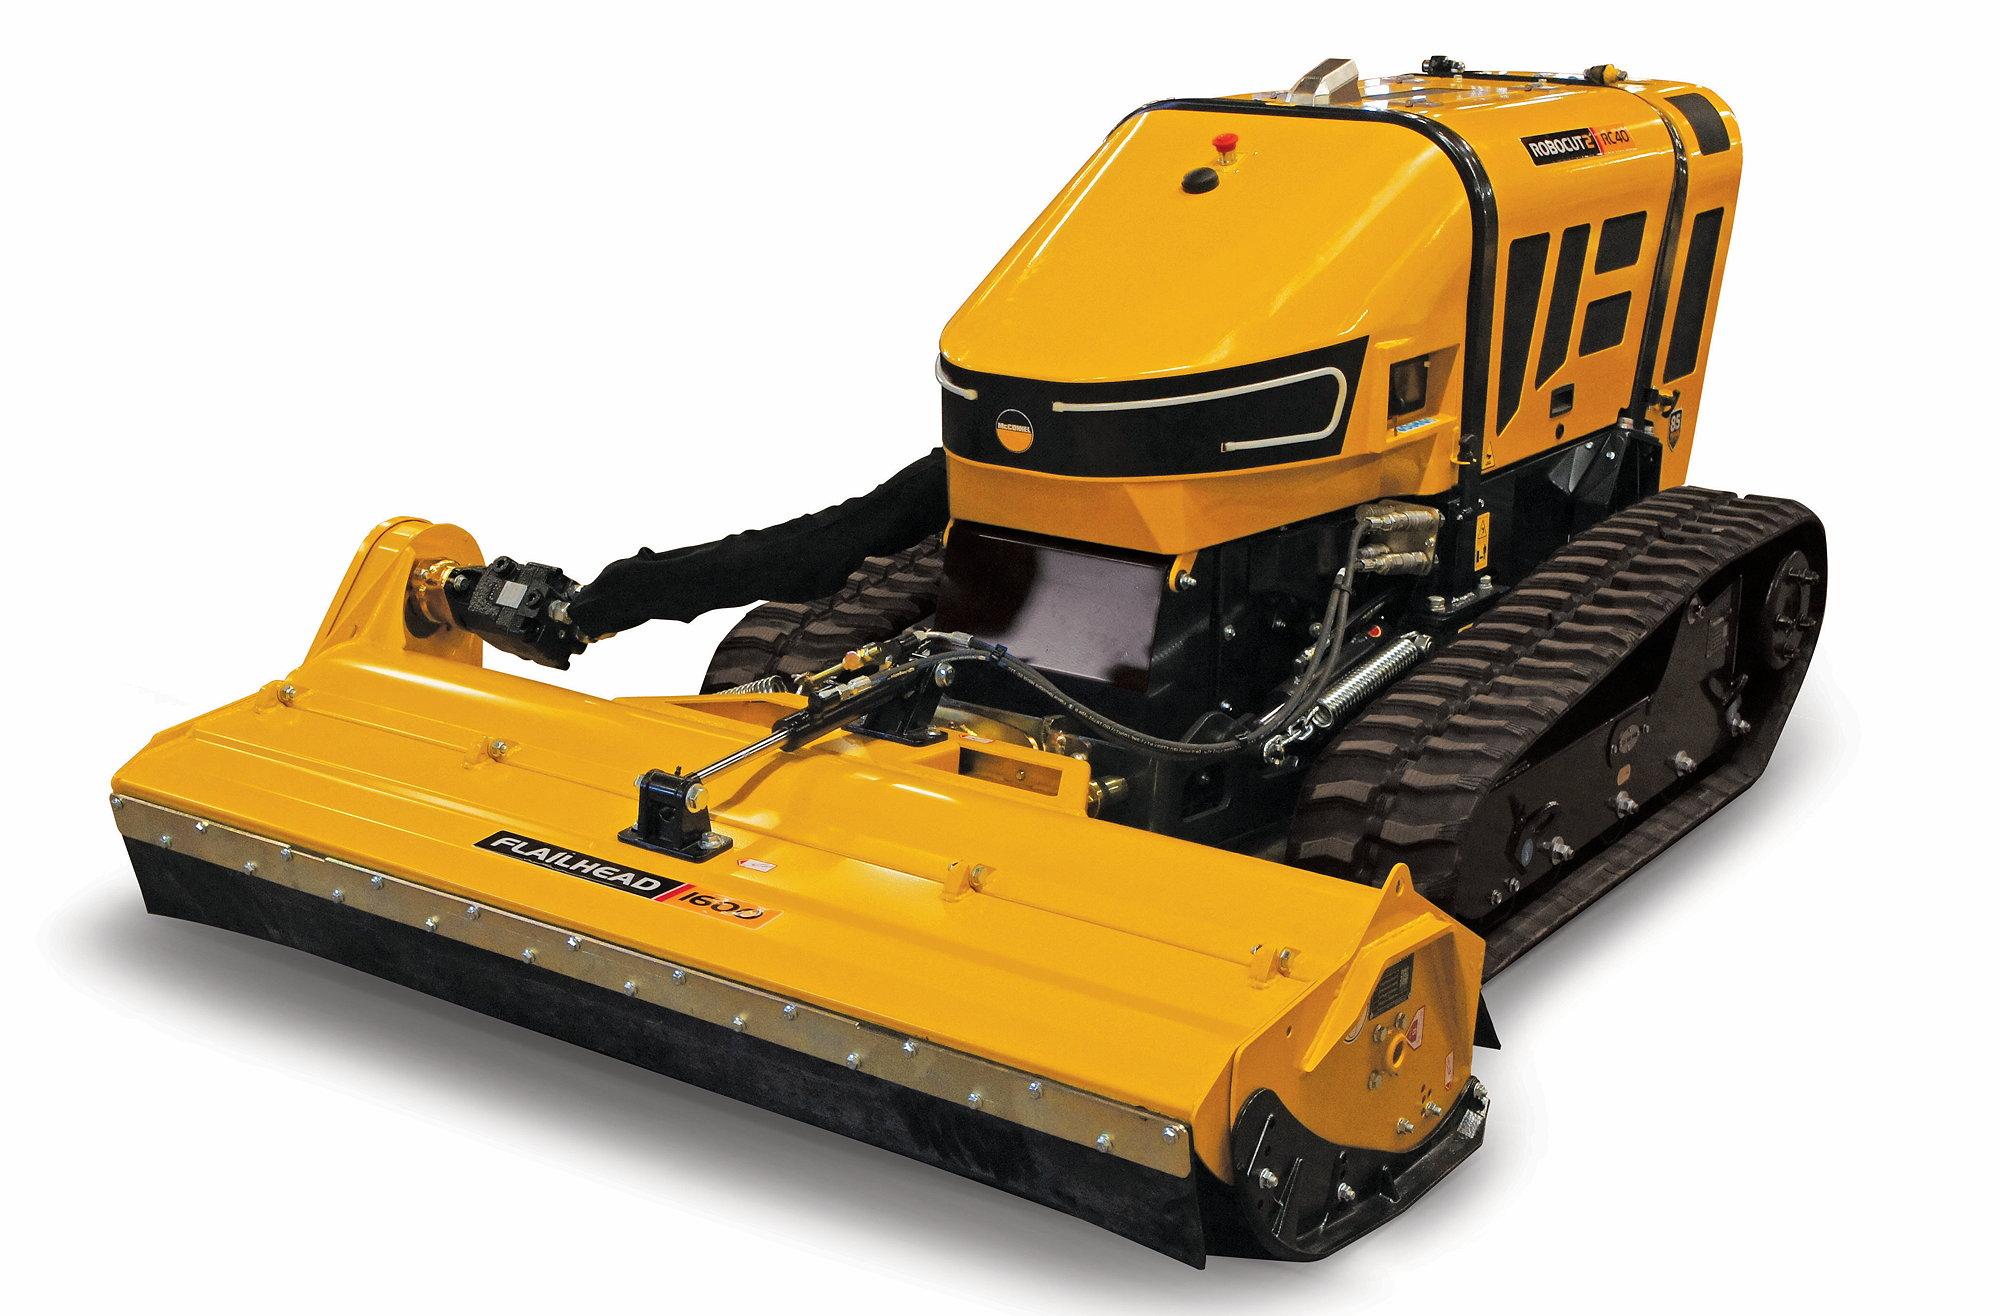 McConnel's new Robocut2 RC40 offers a 40hp power unit